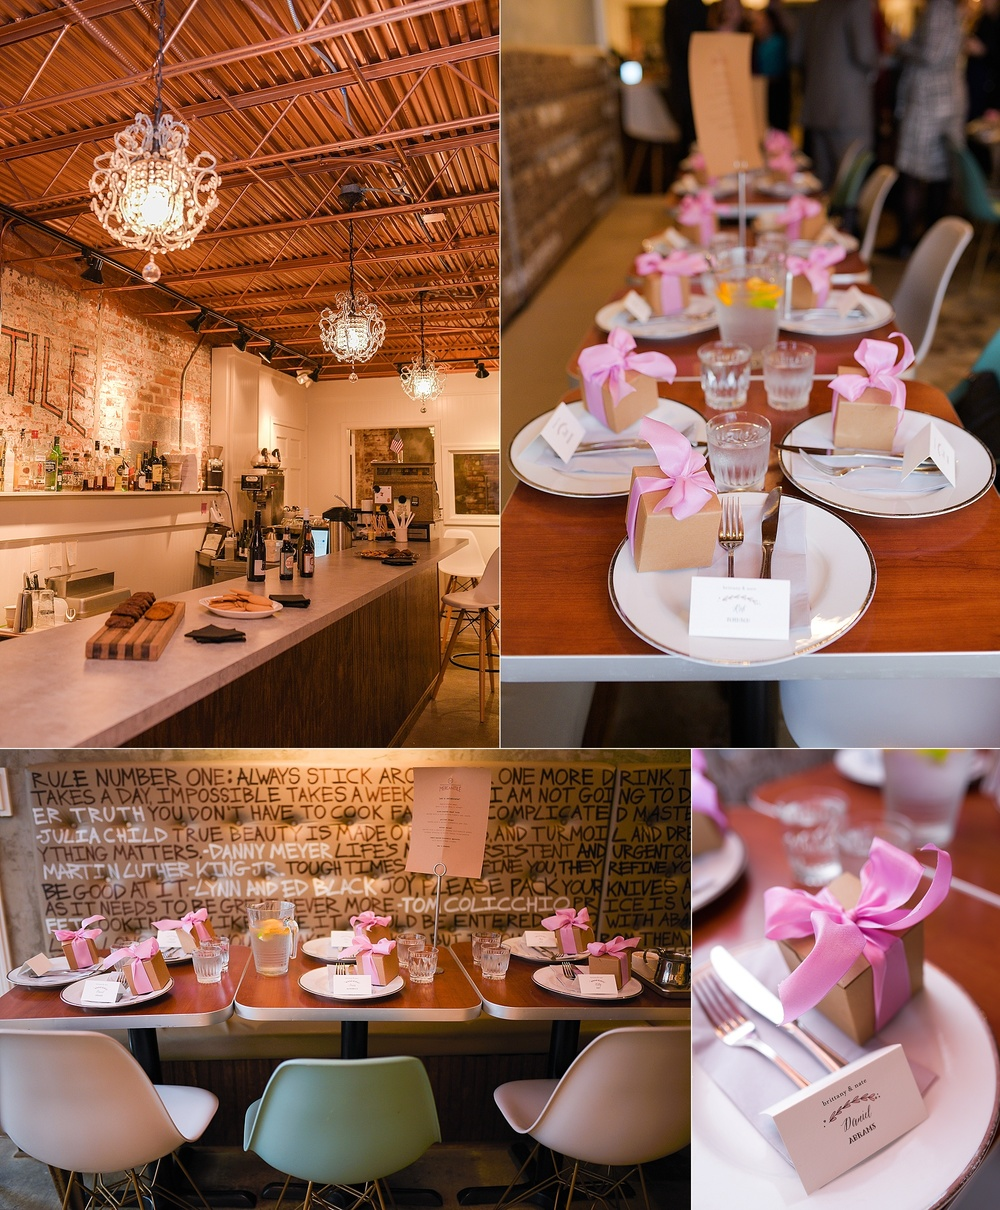 fredericksburg-wedding-church-mercantile_0035.jpg